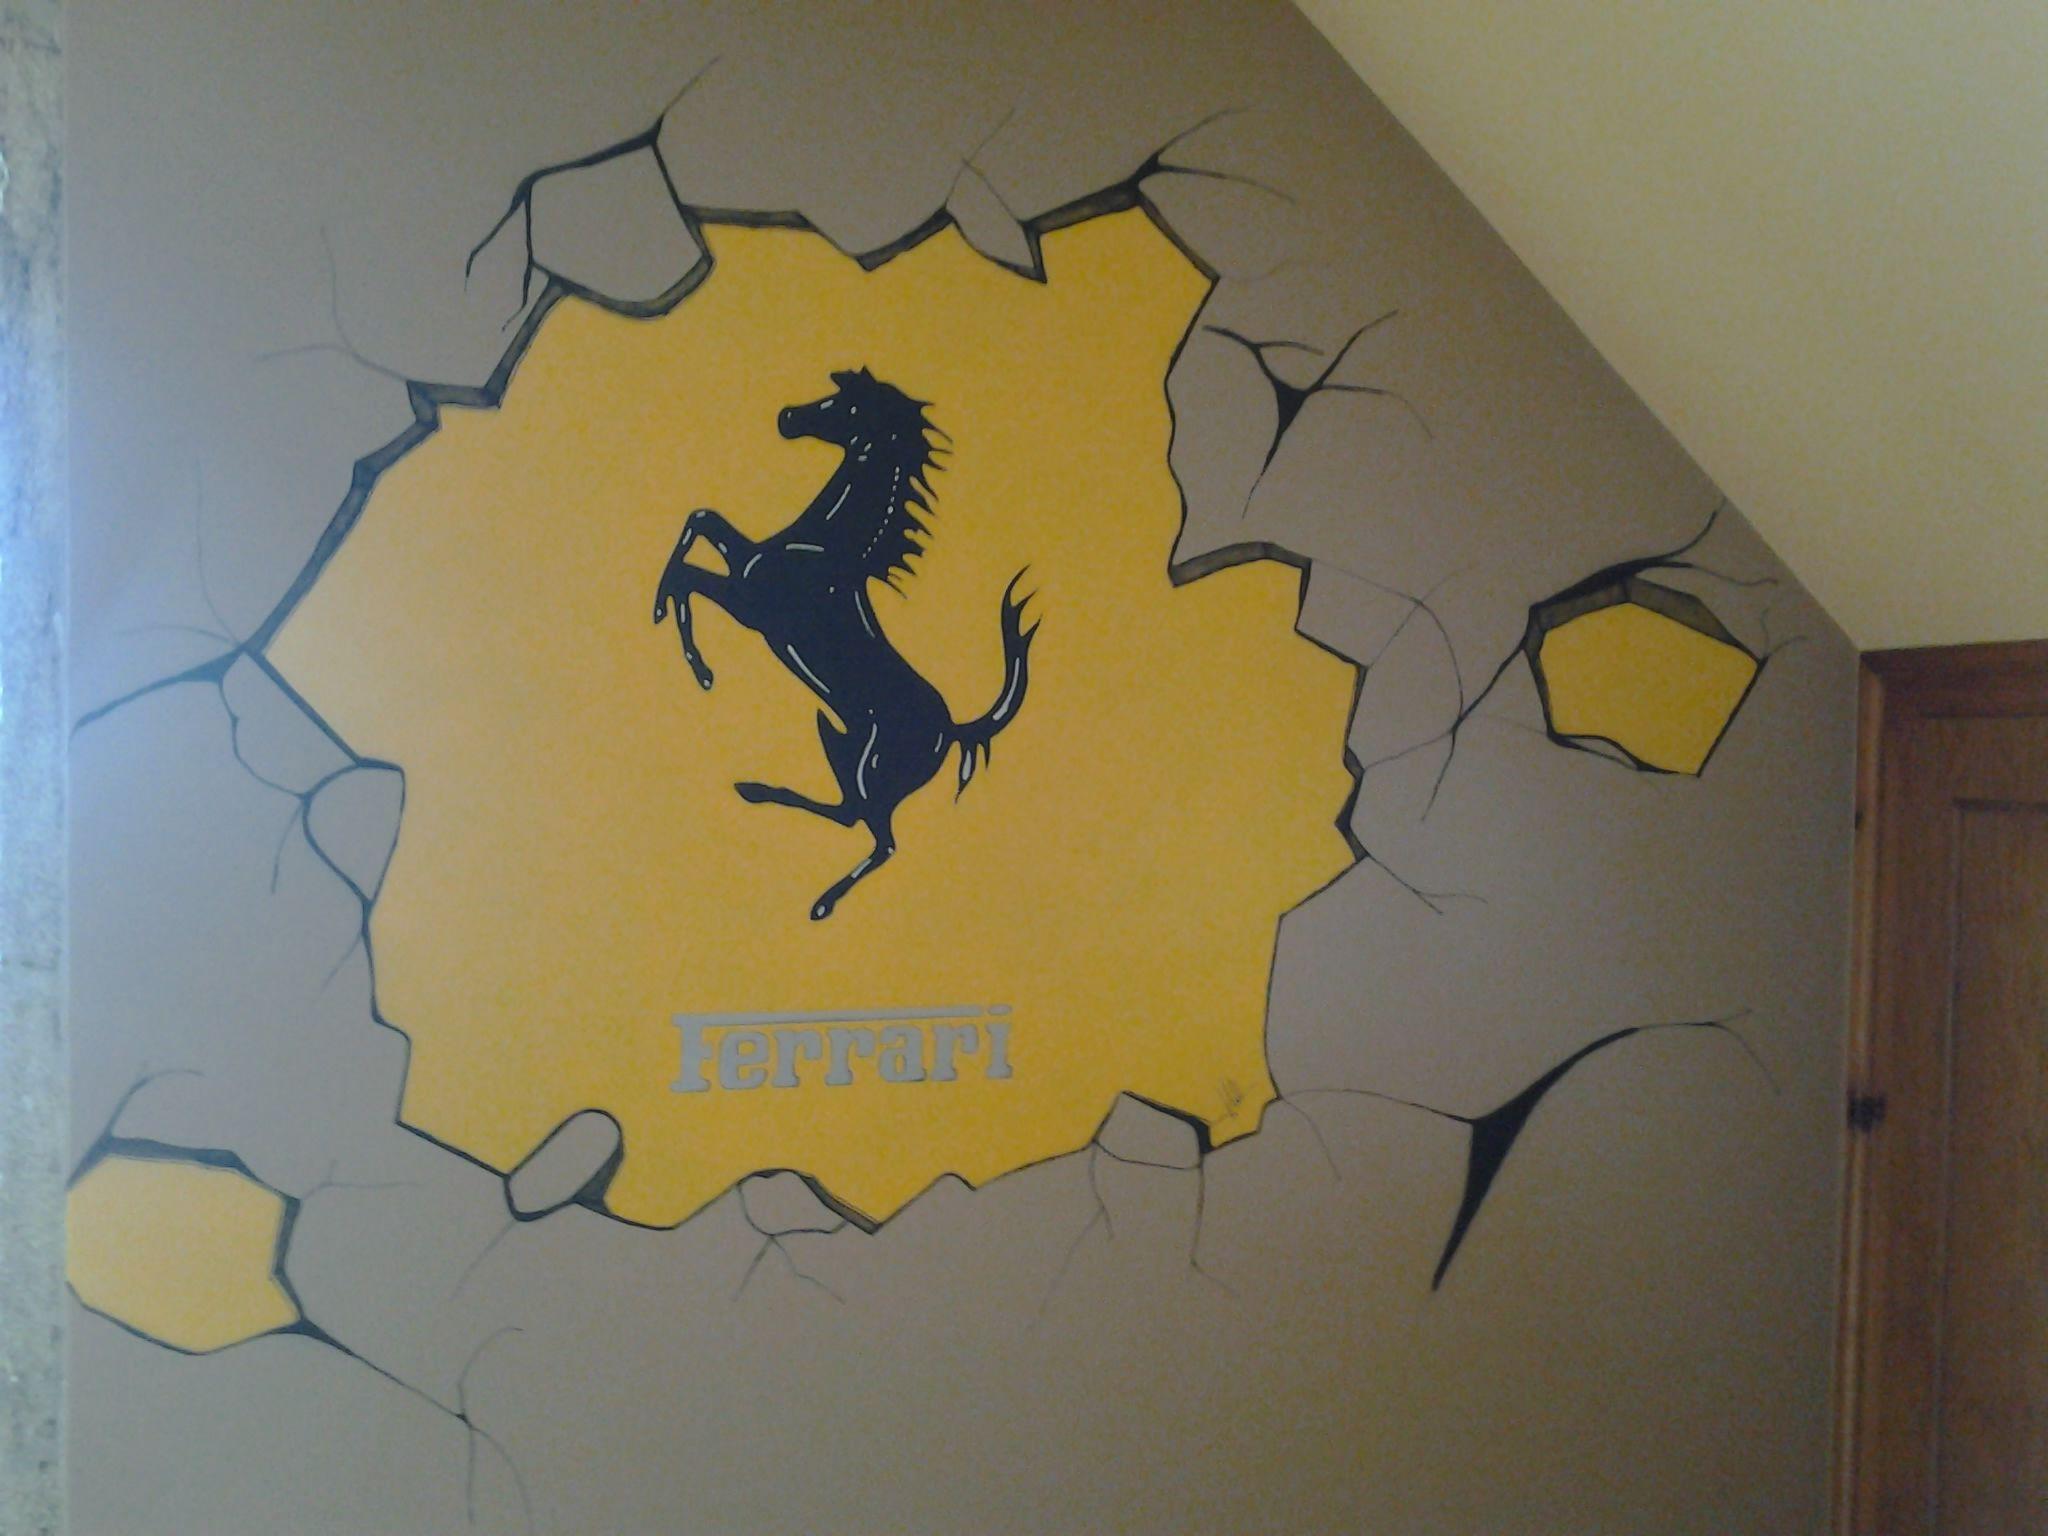 Pared imitacion rota. | Gallery wall decoration | Pinterest | Wall ...